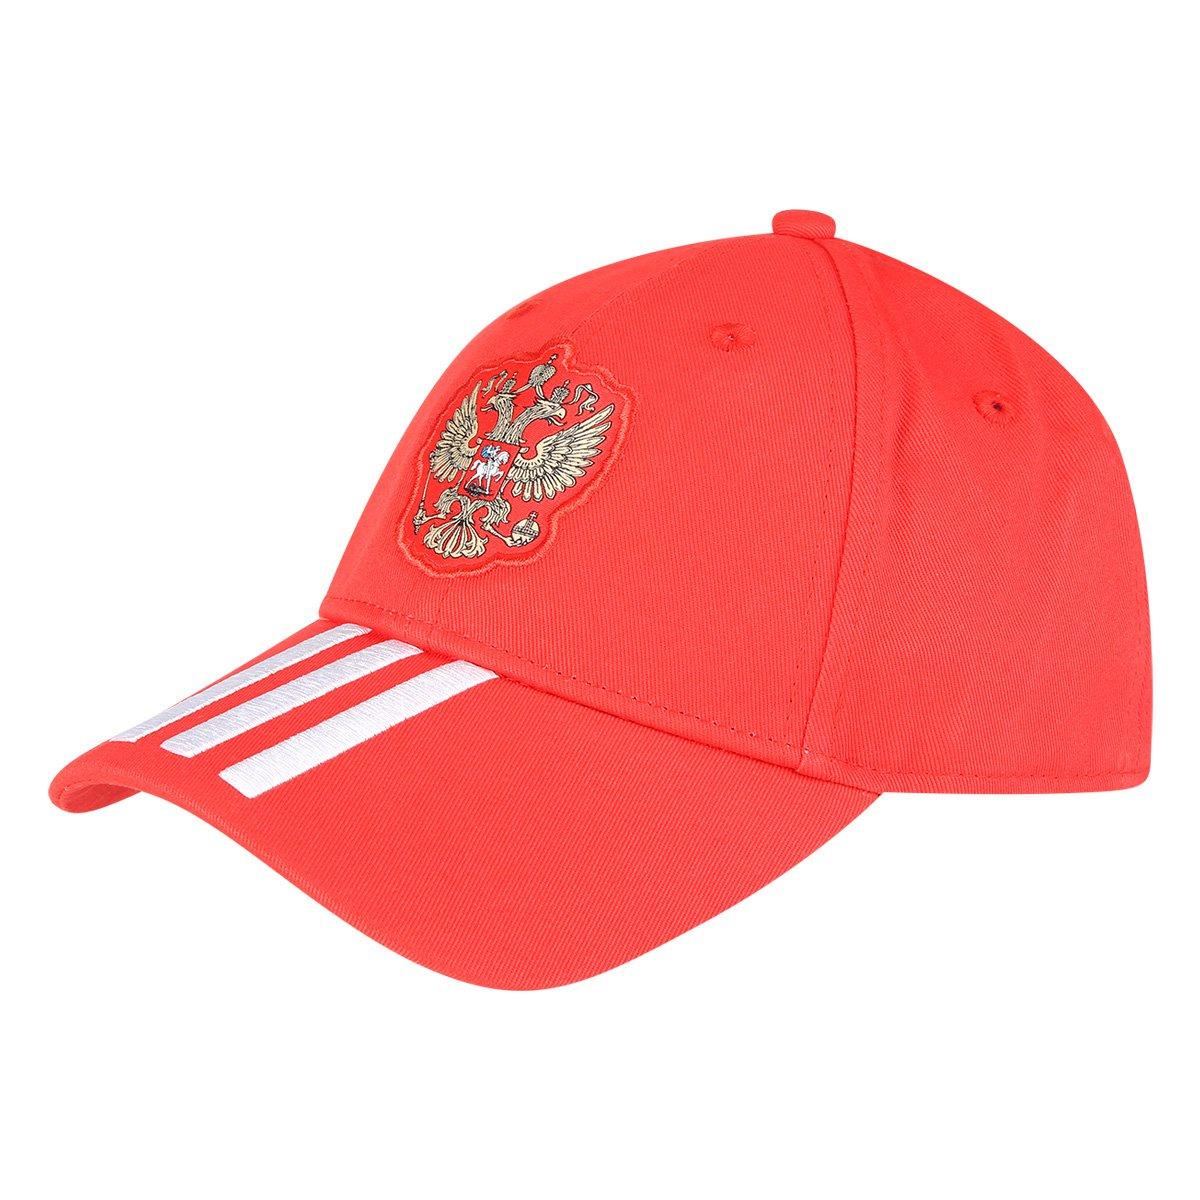 0fc38e47b0f42 Boné Adidas Aba Curva Rússia 3S - Compre Agora